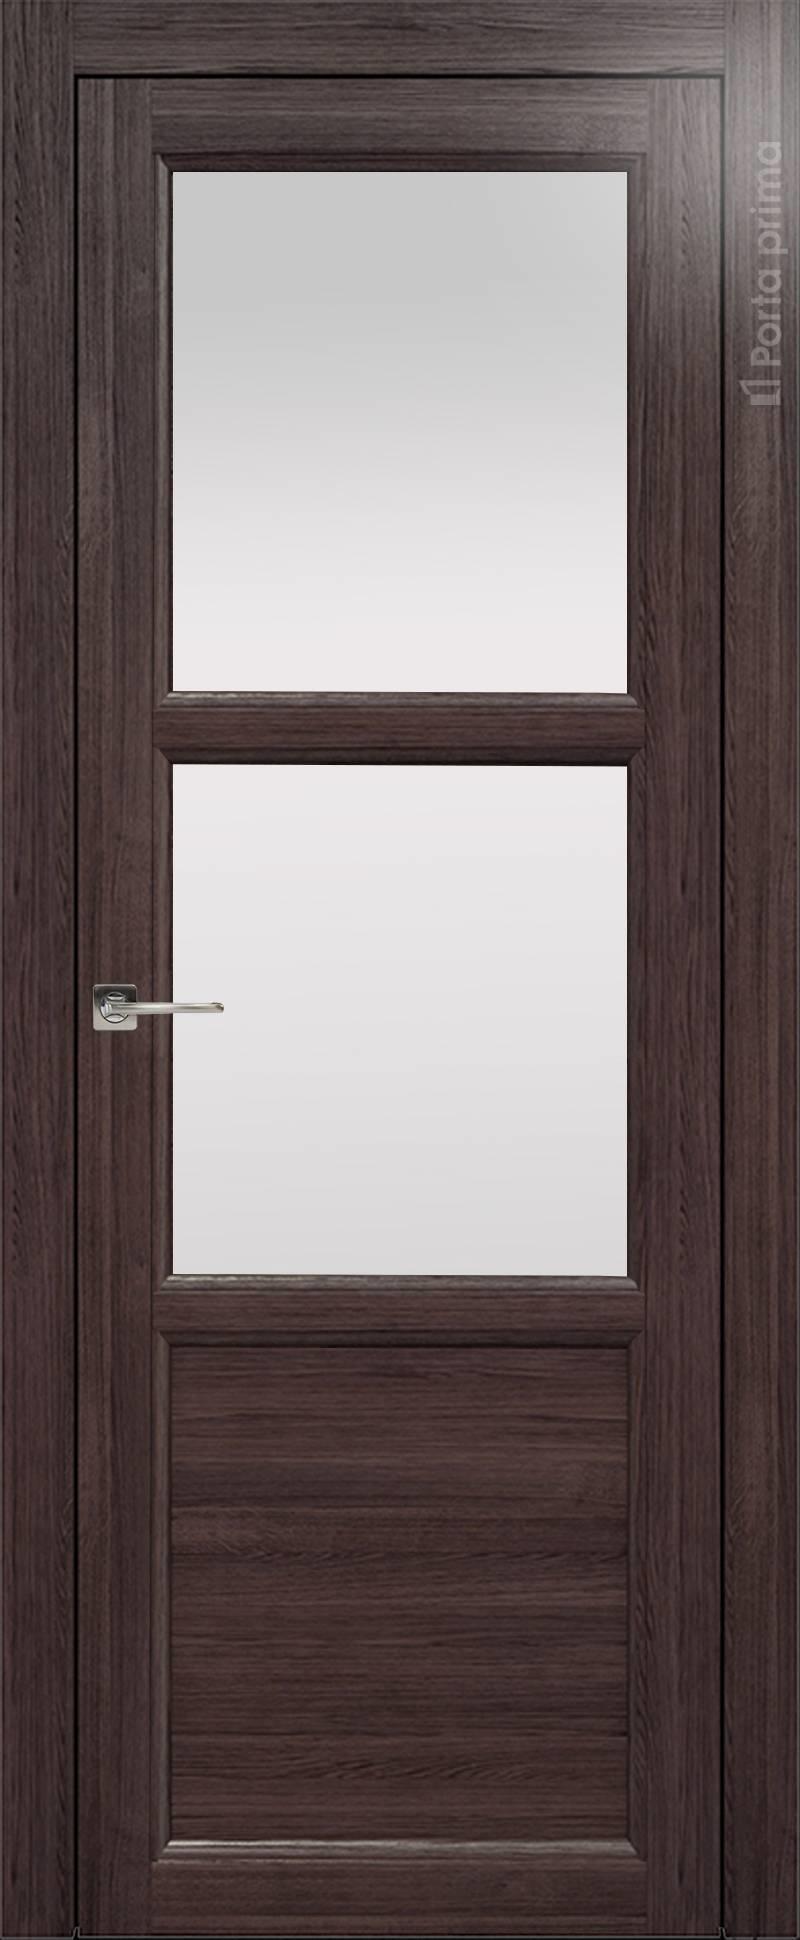 Sorrento-R Б2 цвет - Венге Нуар Со стеклом (ДО)